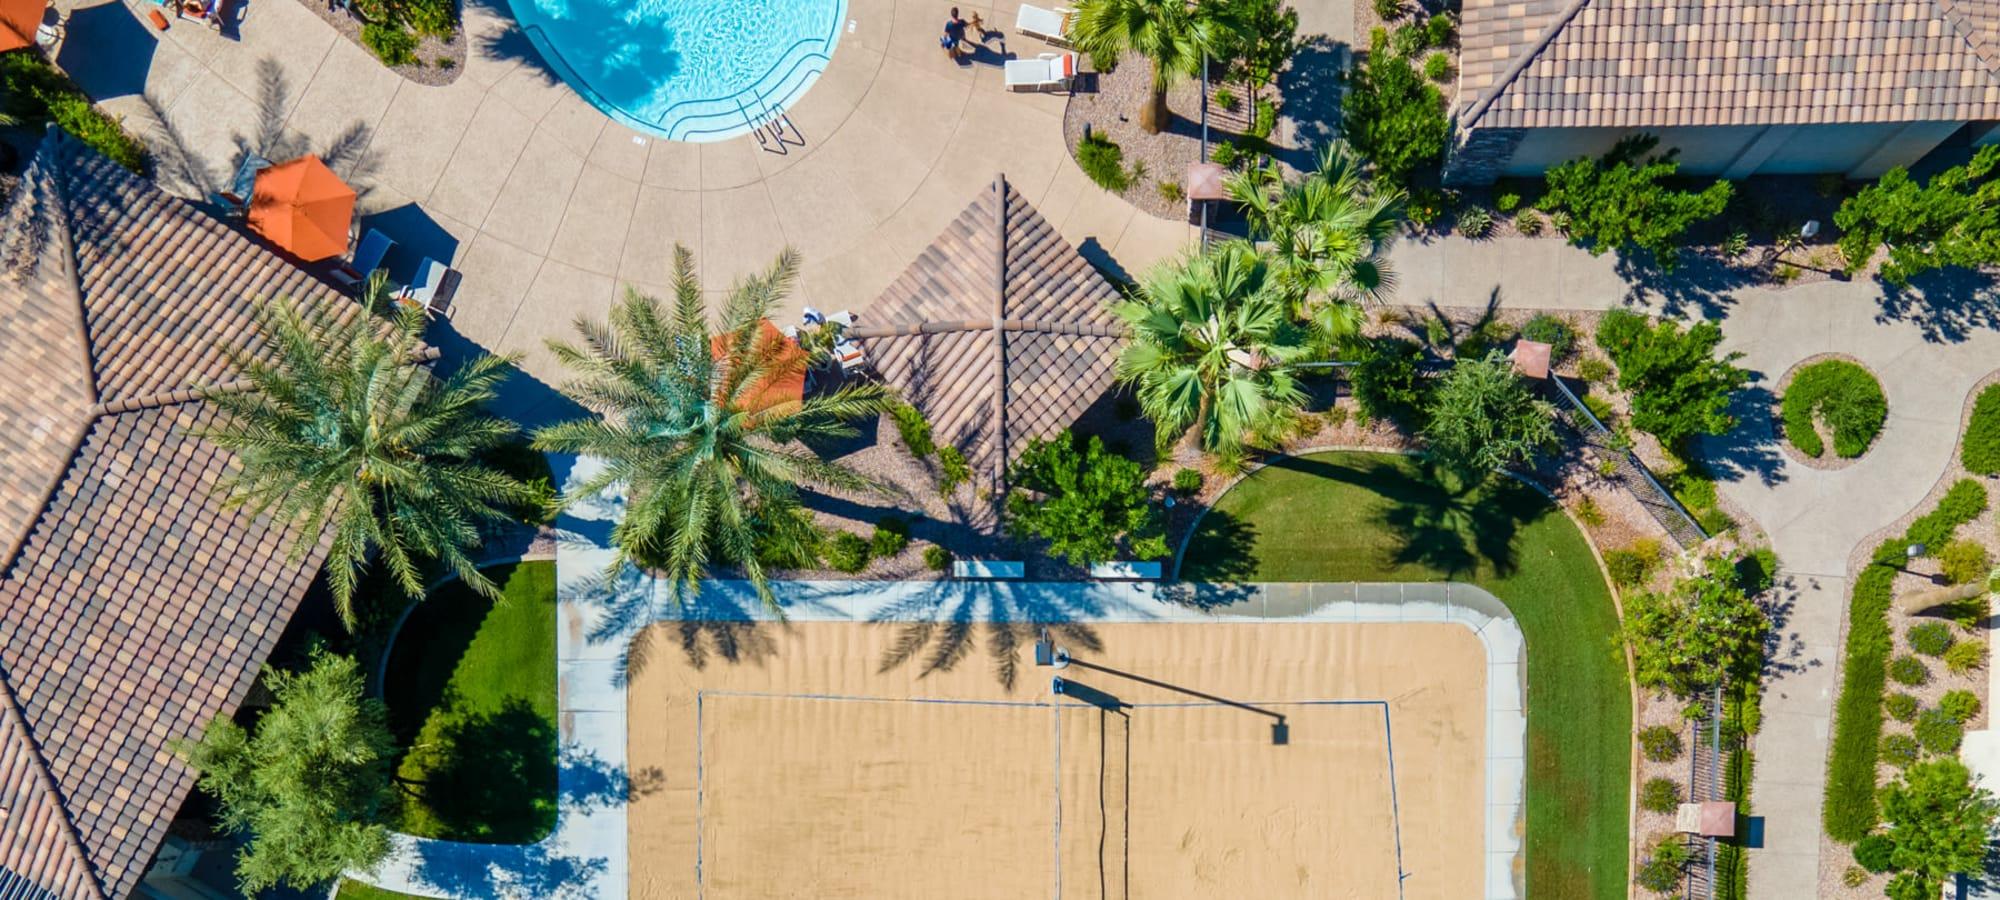 Sand volleyball court at San Milan in Phoenix, Arizona